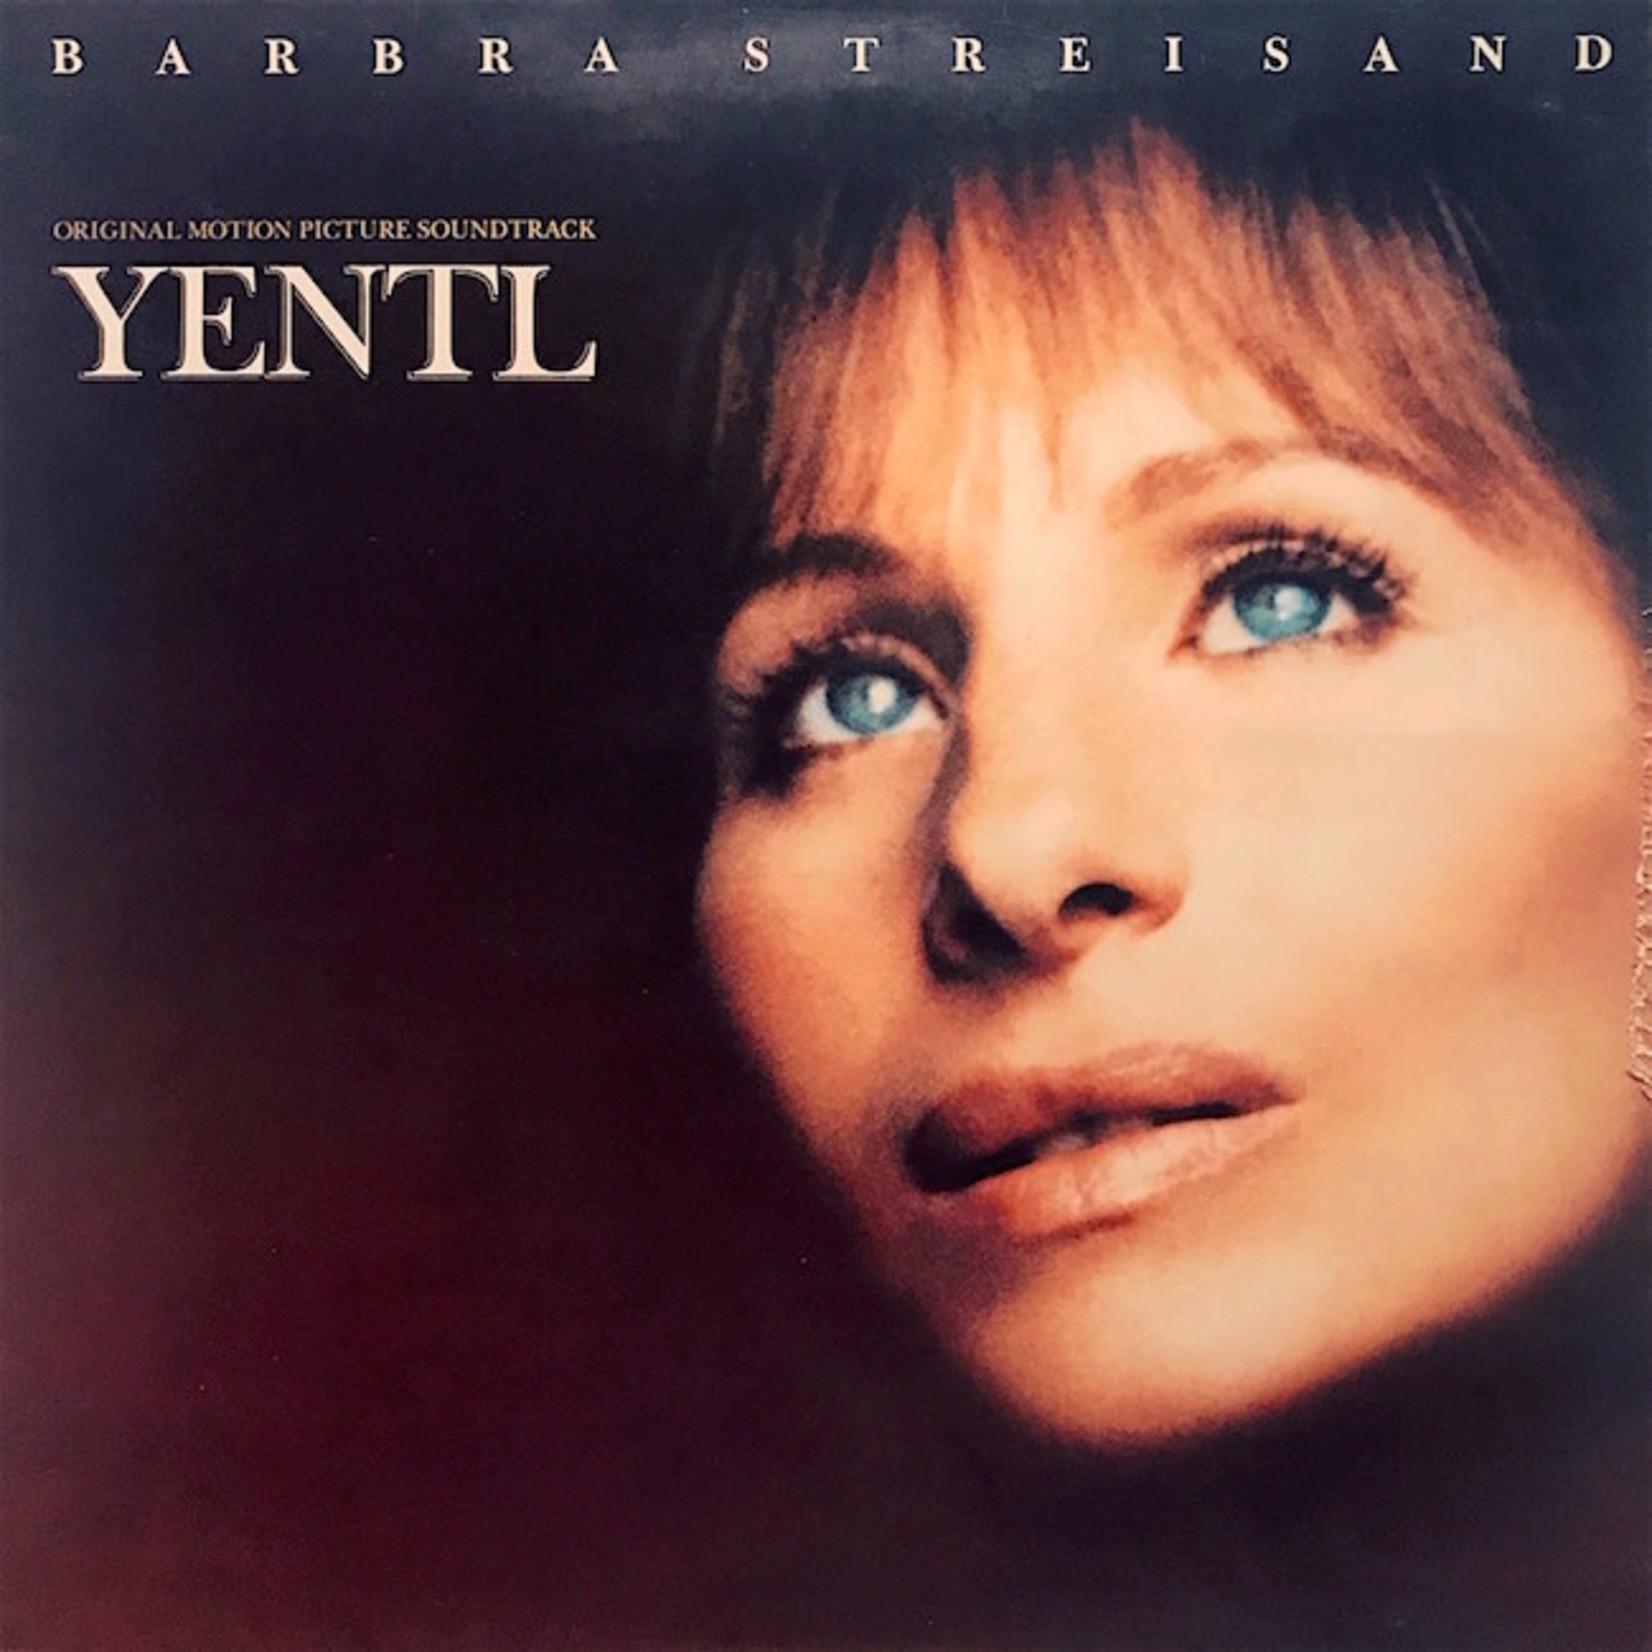 [Vintage] Streisand, Barbra: Yentl (Soundtrack)